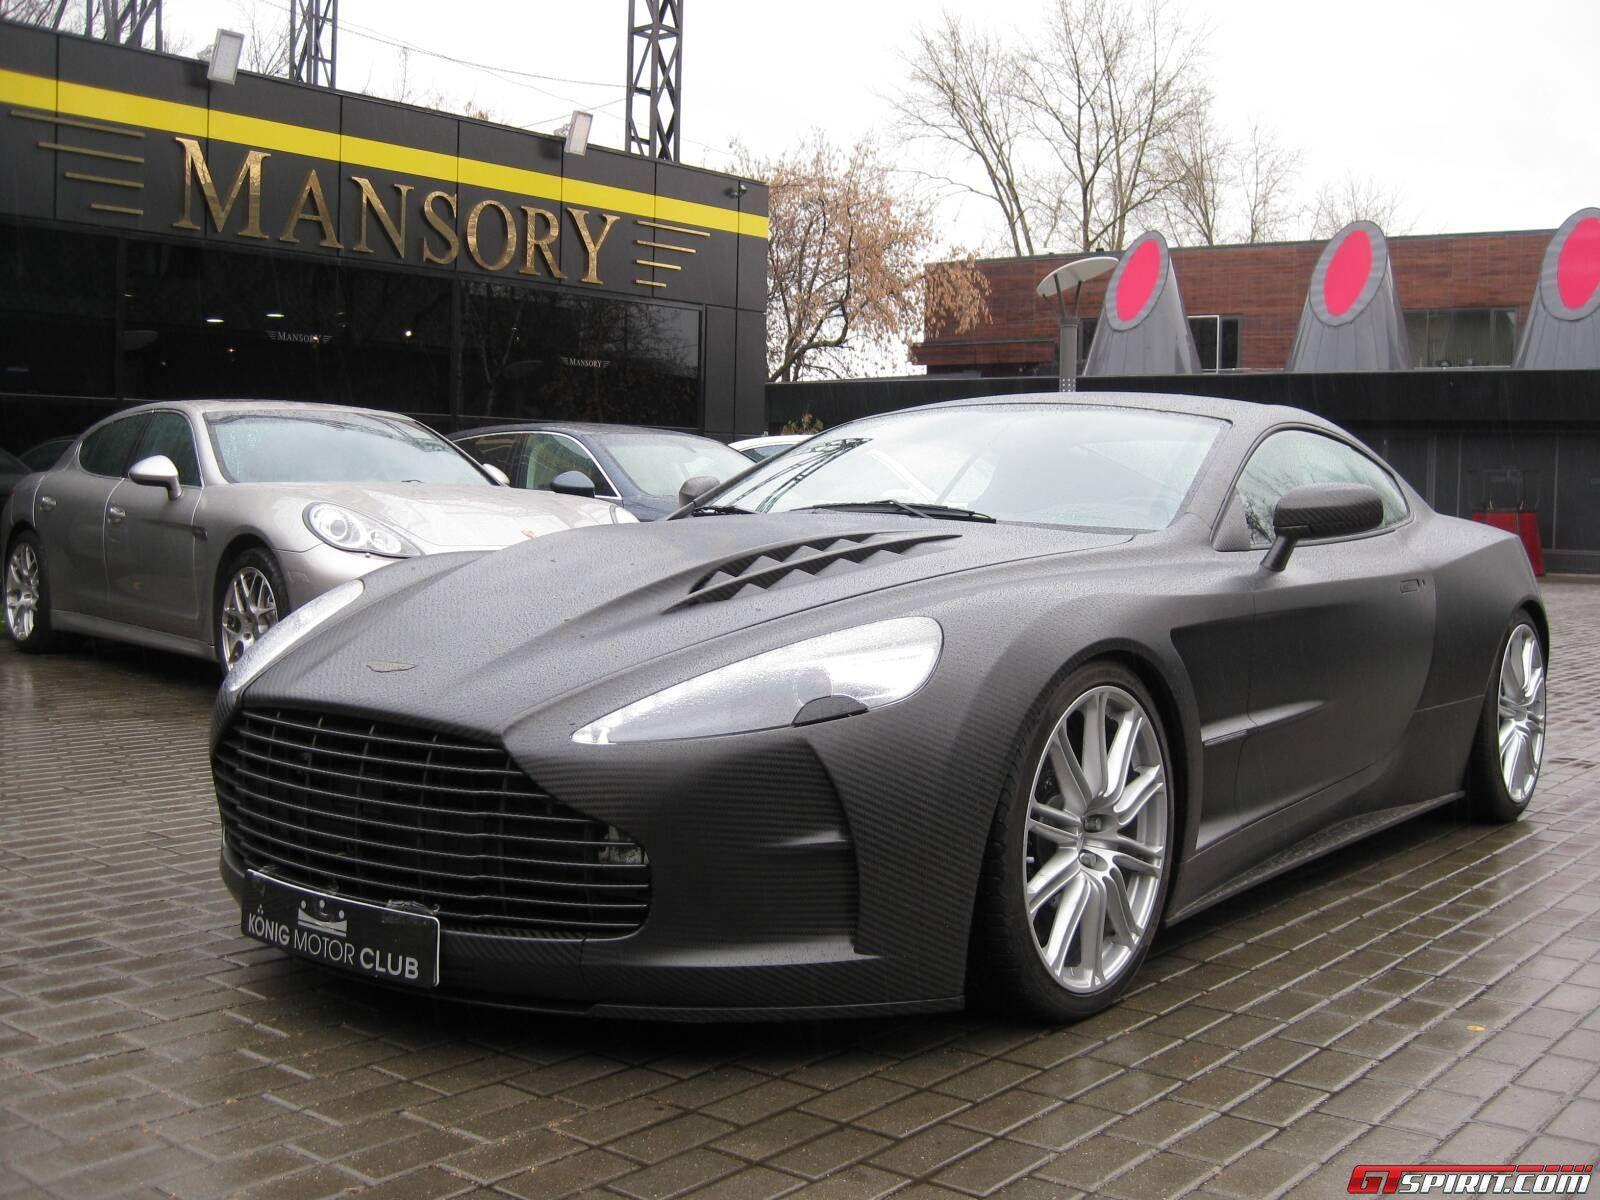 Mansory Cyrus a carbon fibre rebo d Aston Martin DBS